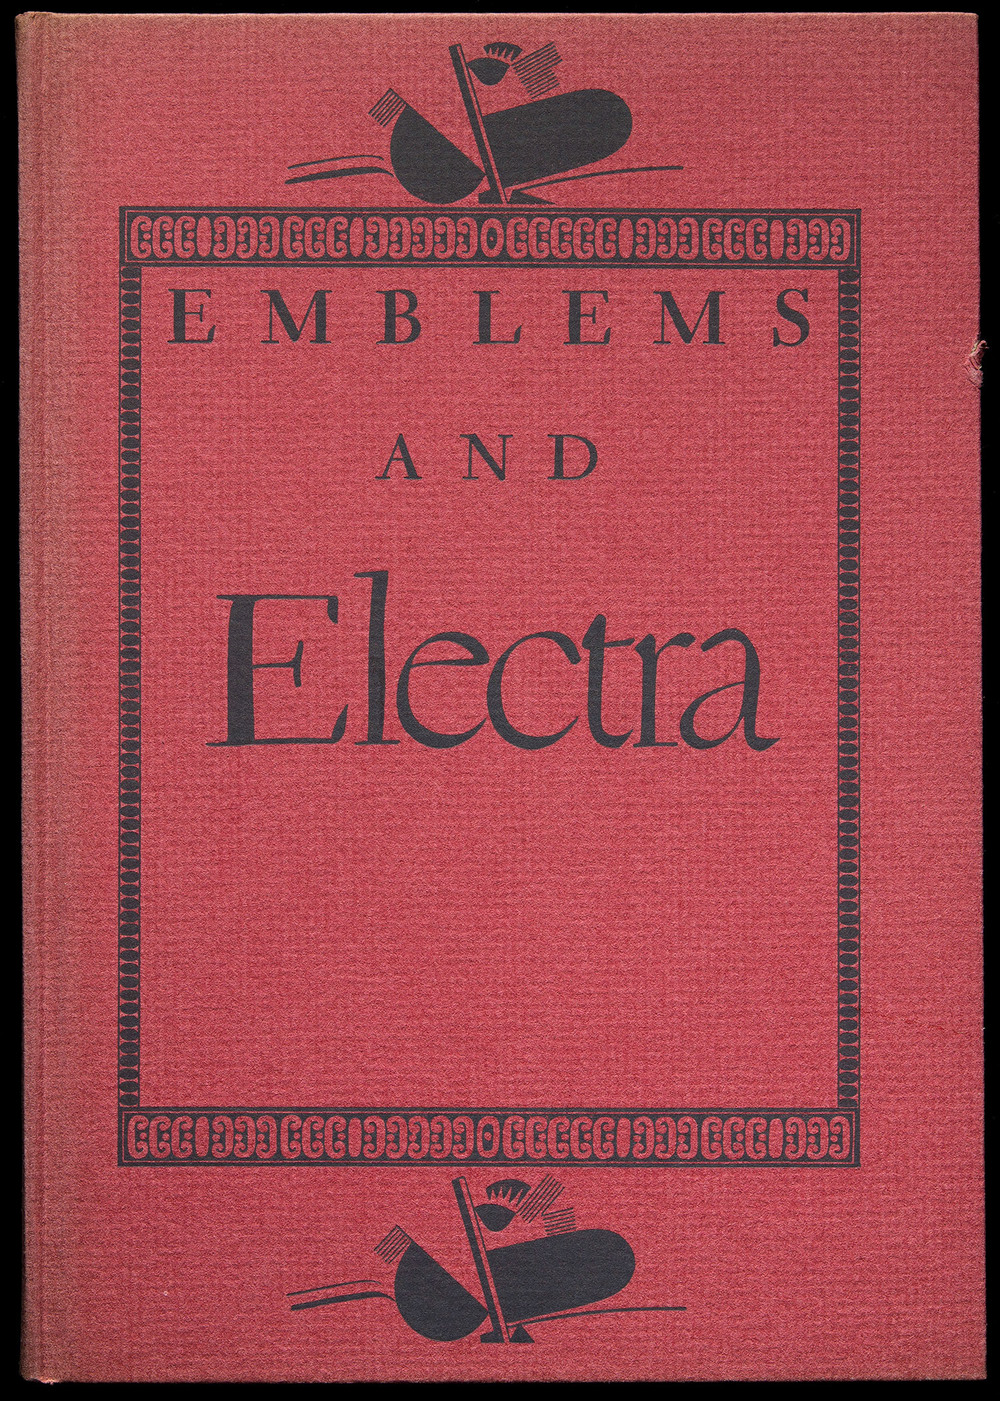 A Bakers Dozen of Emblems and Electra , Mergenthaler Linotype, Brooklyn, 1935, 14 x 20 cm